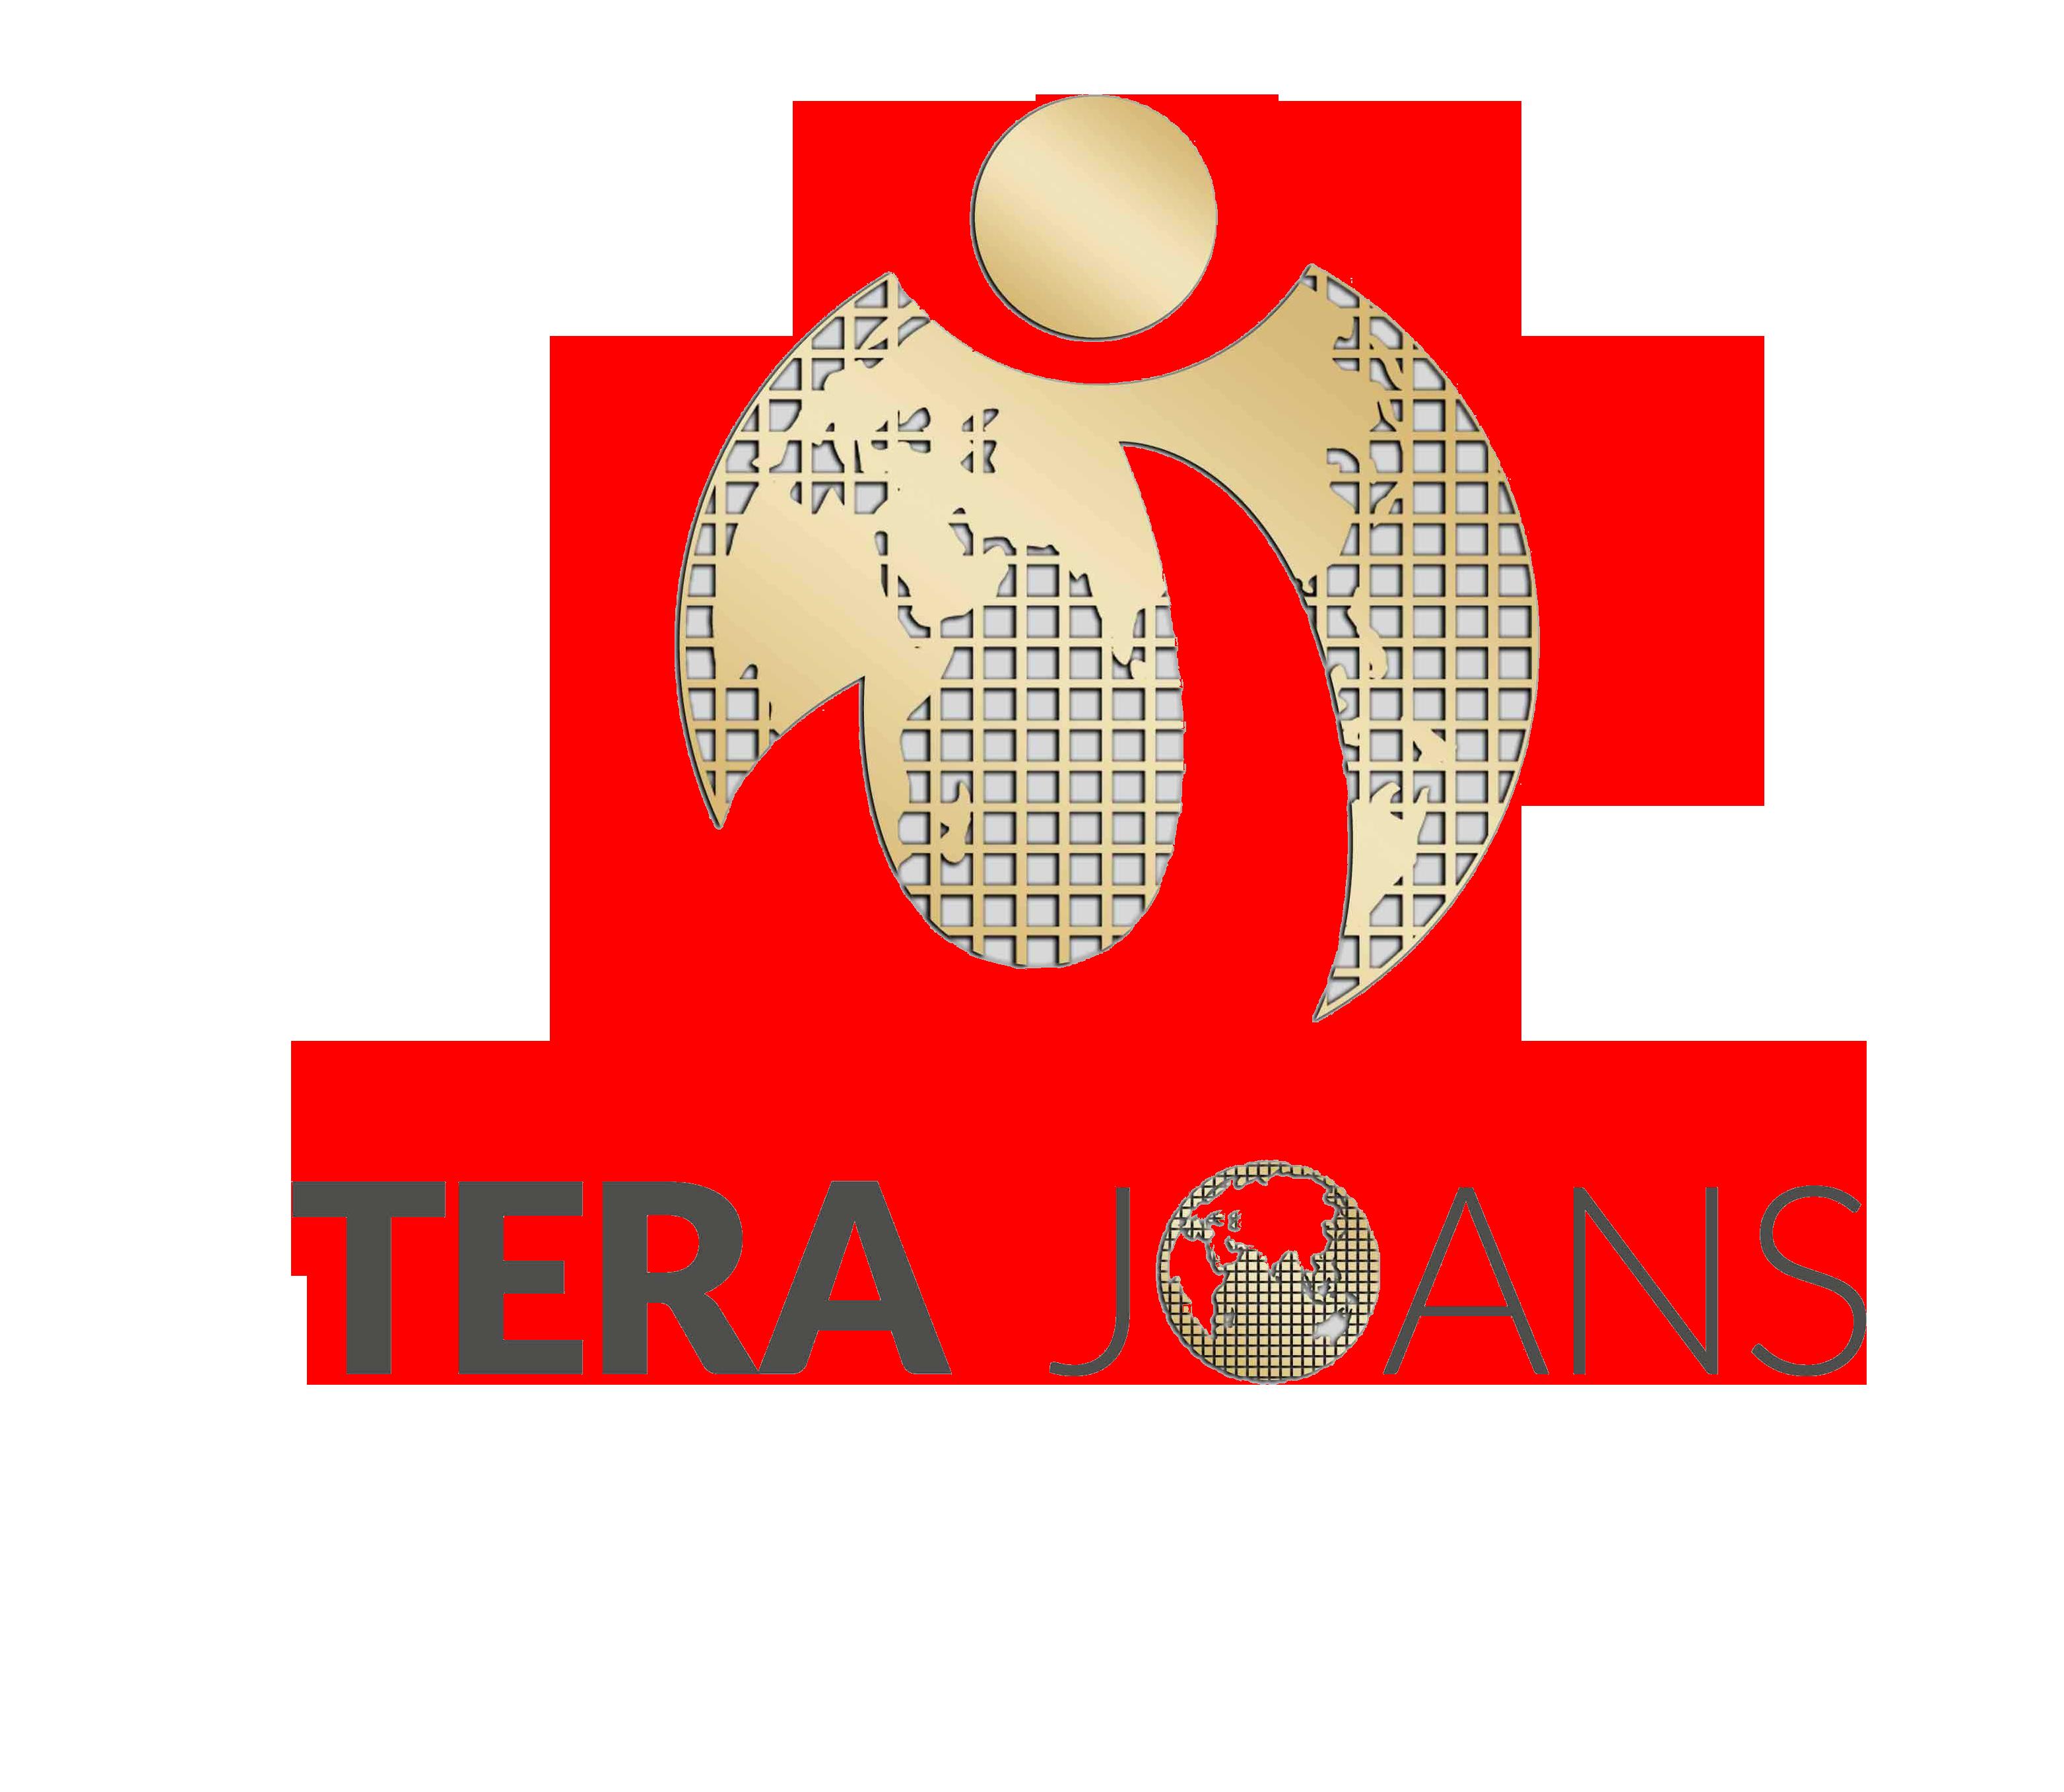 https://terajoans.co.uk/